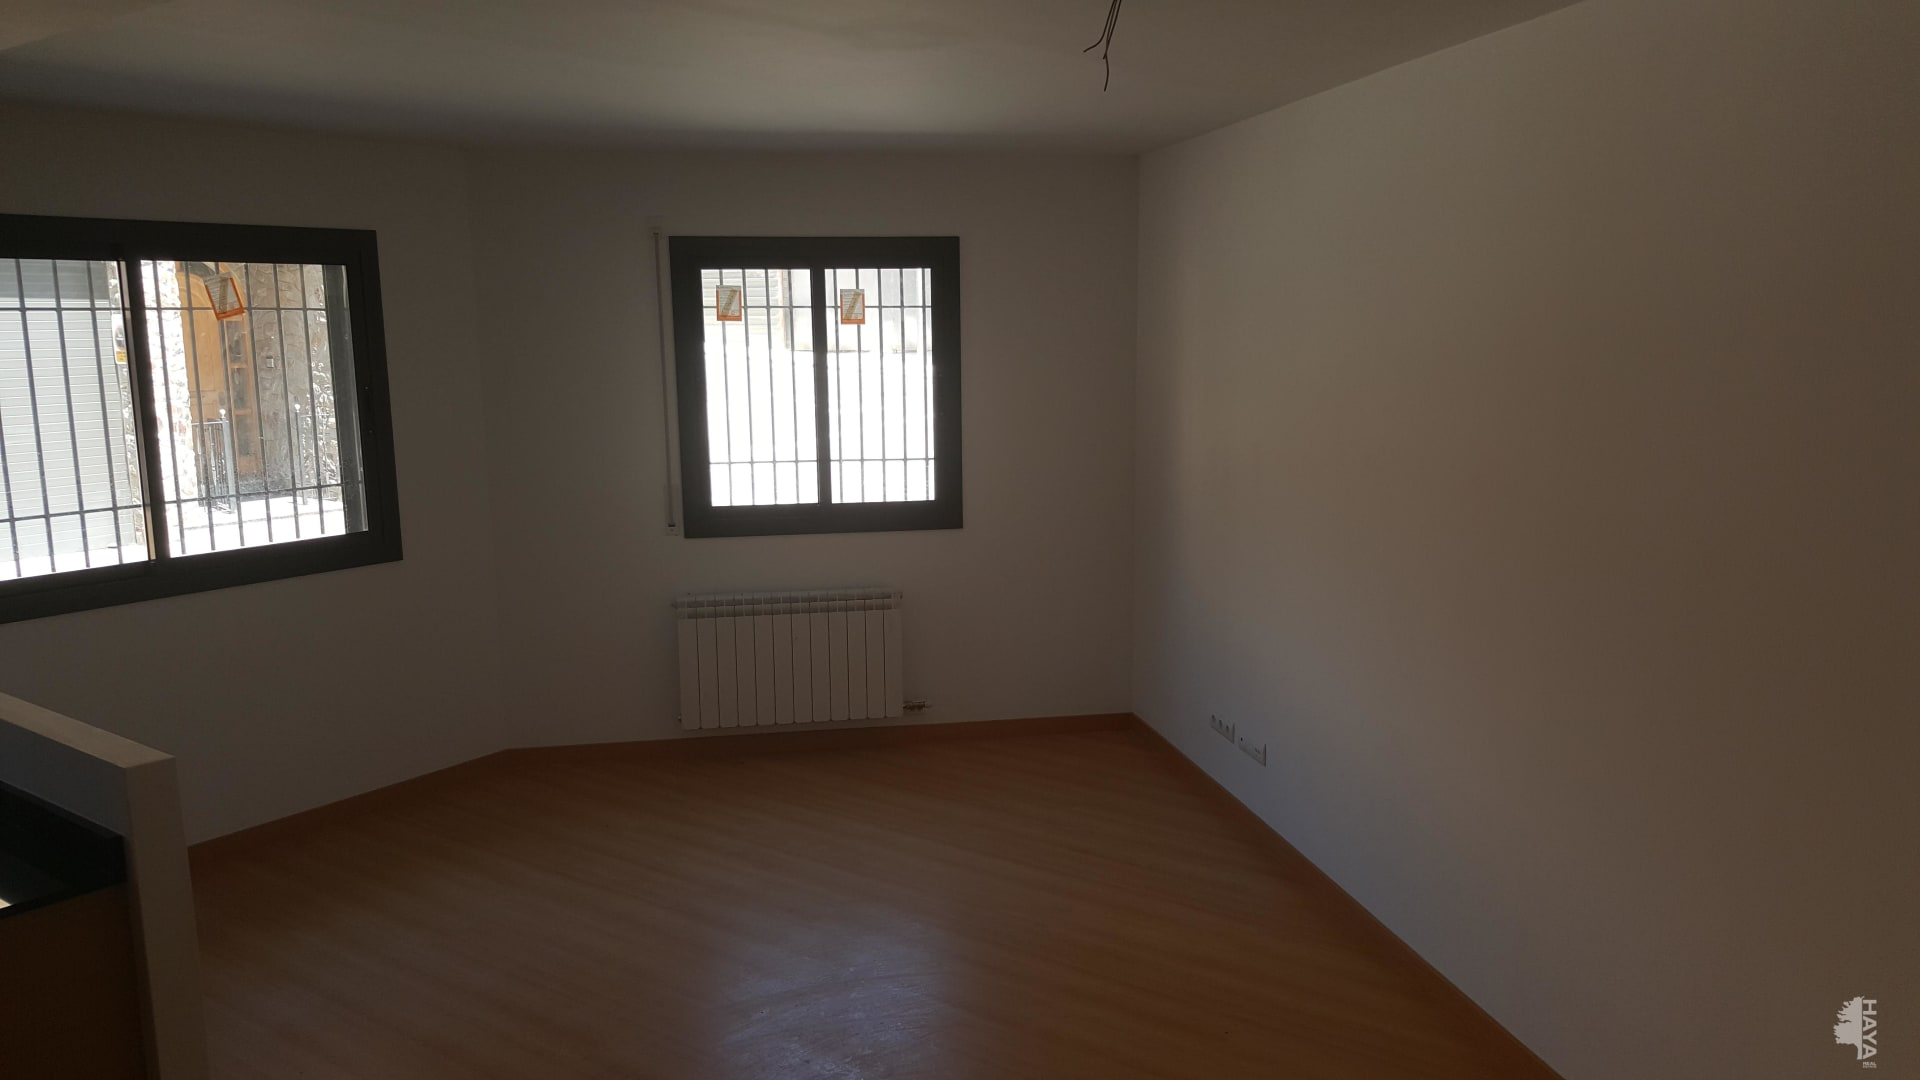 Piso en venta en Puigbò, Sallent, Barcelona, Calle Bisbe Valls, 64.600 €, 1 habitación, 1 baño, 52 m2